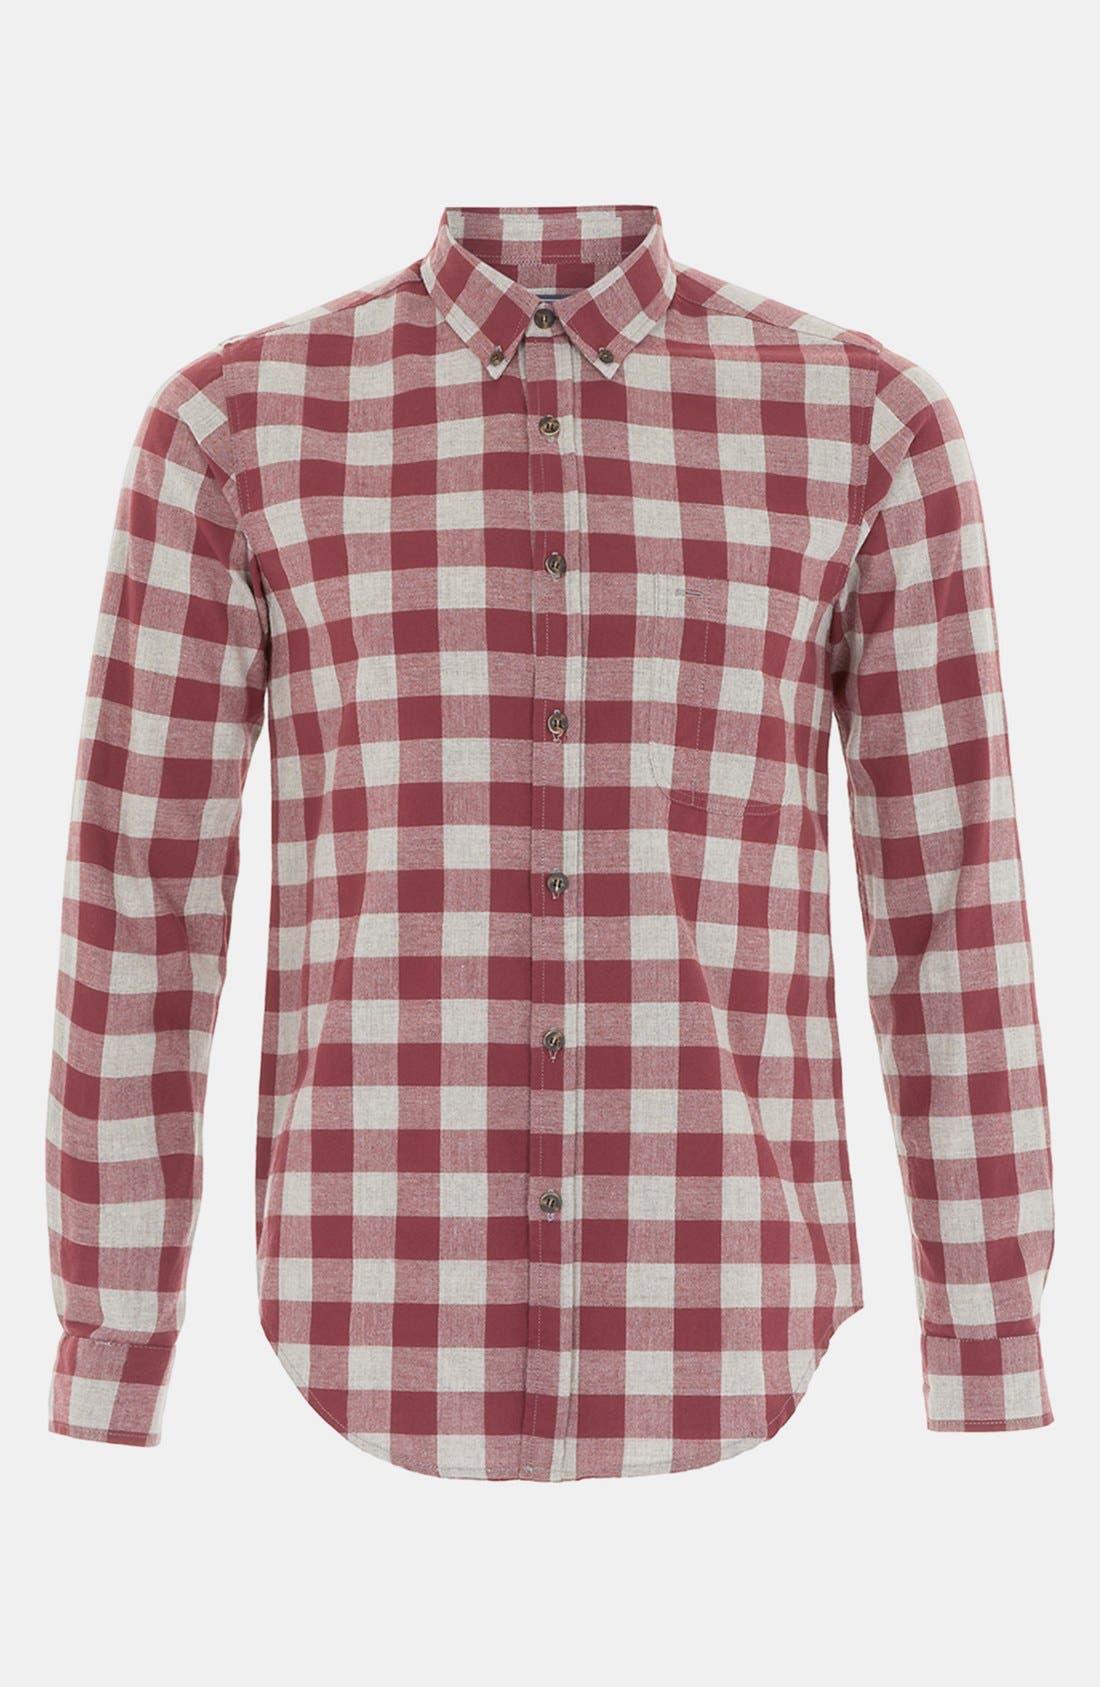 Alternate Image 1 Selected - Topman Check Woven Shirt